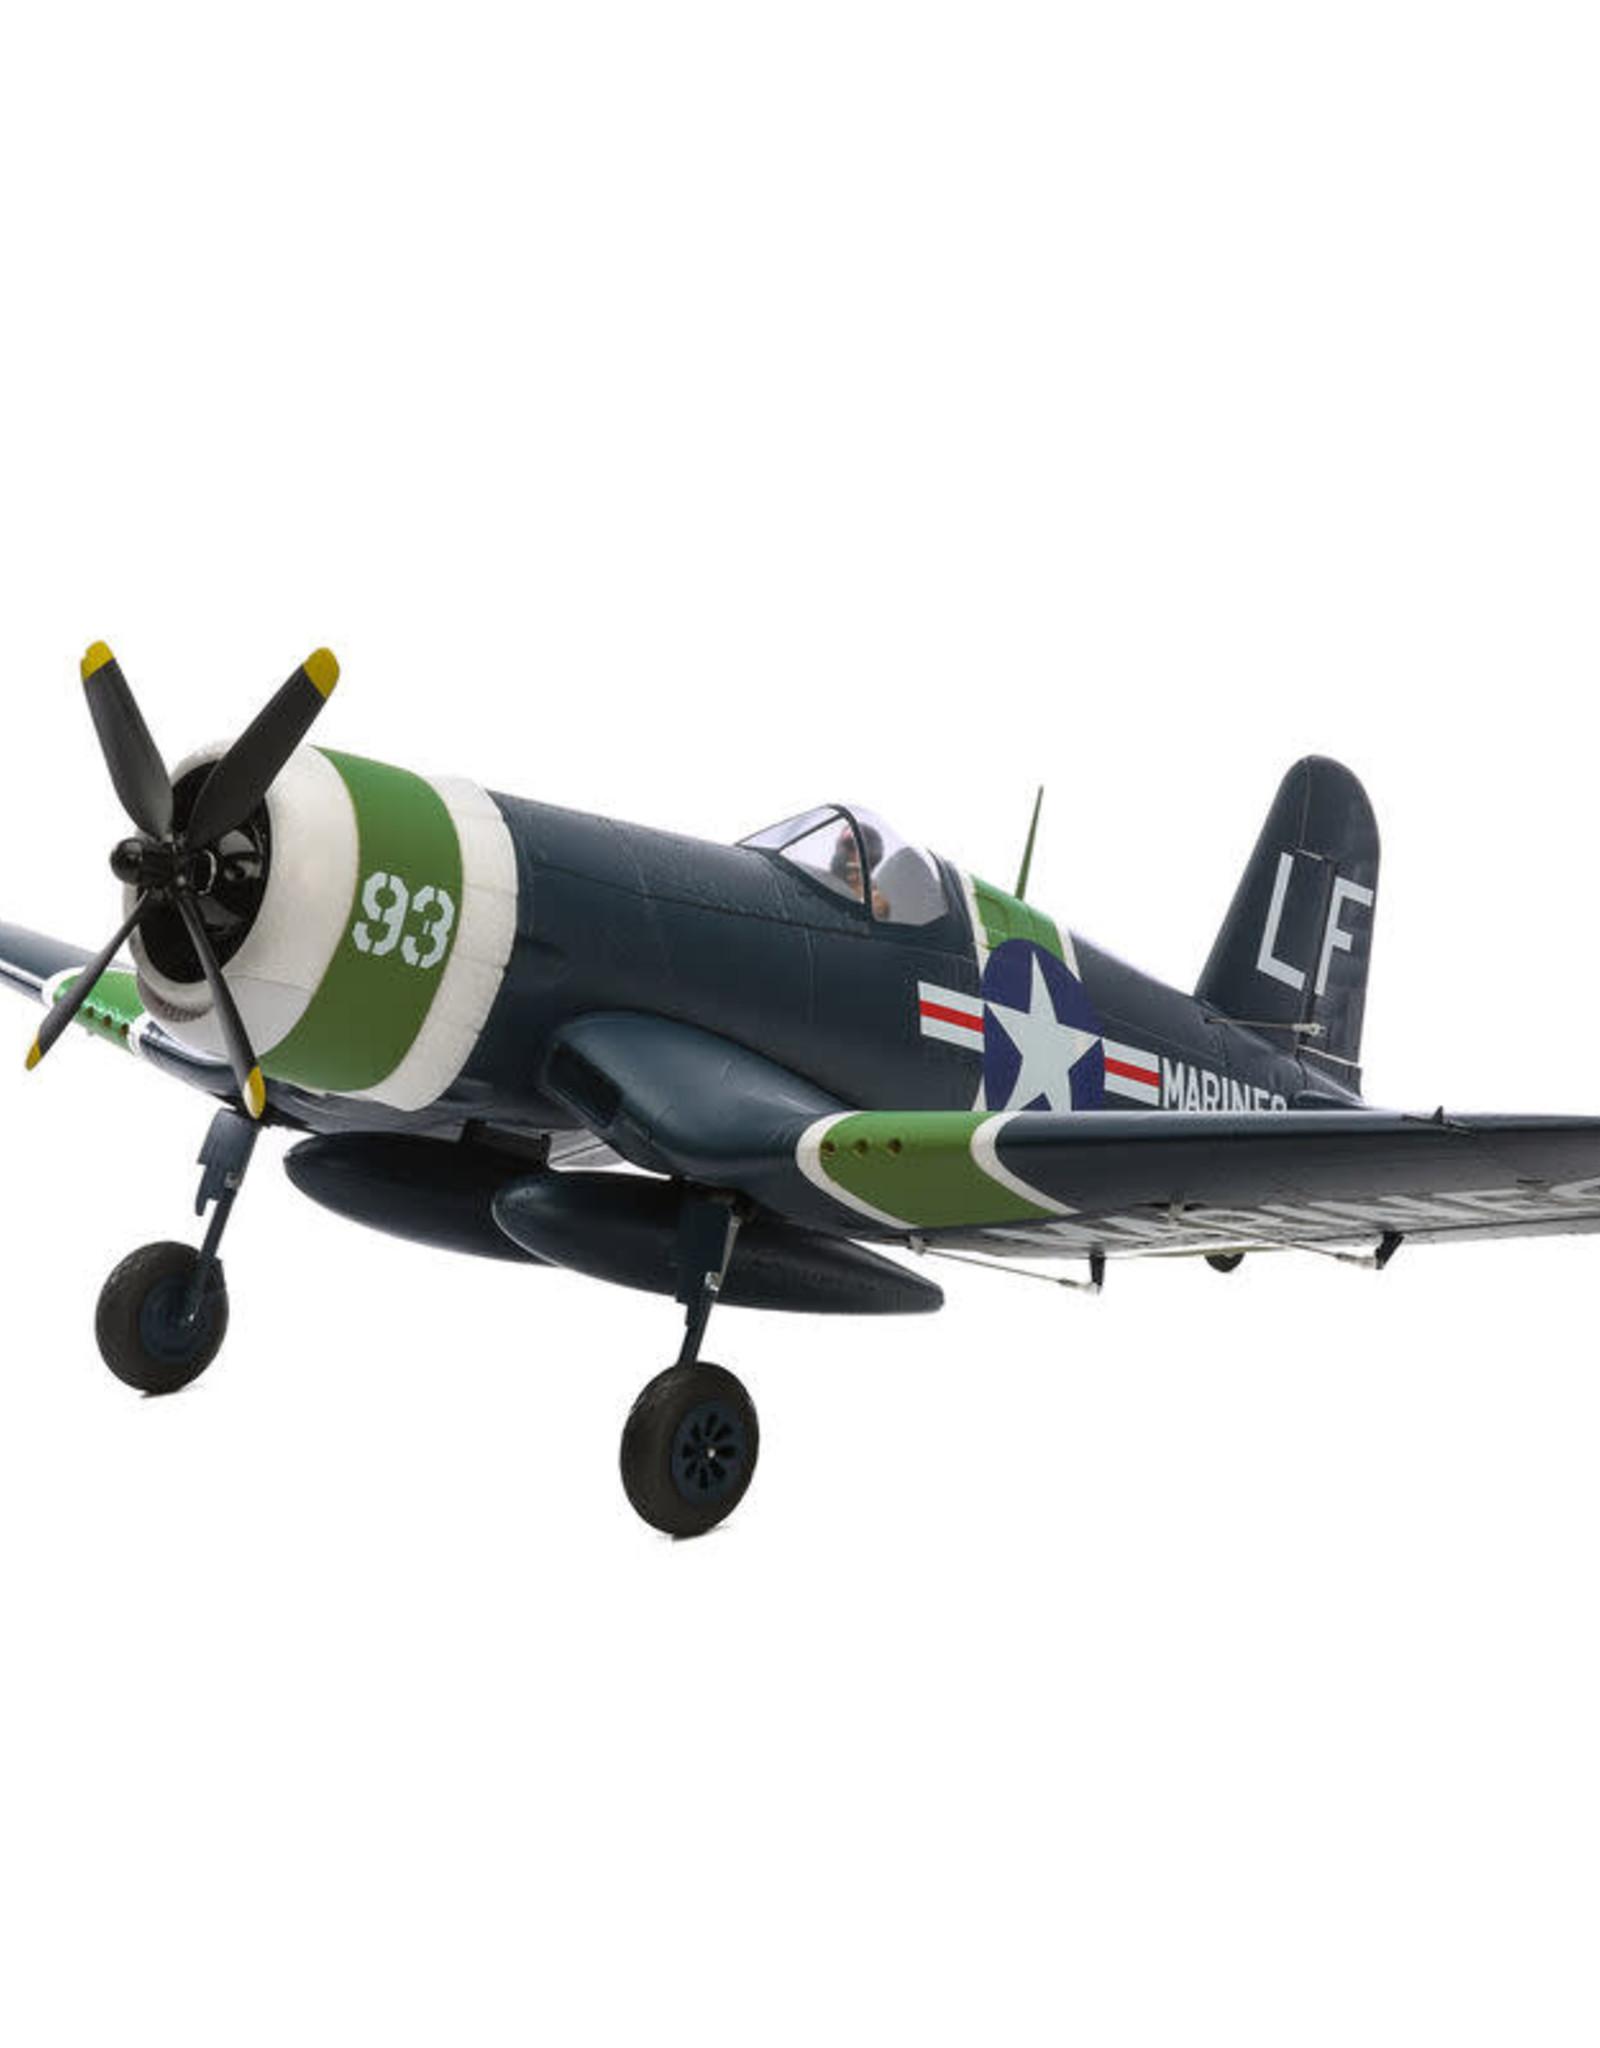 E-flite EFL8550 F4U-4 Corsair 1.2m BNF Basic with AS3X